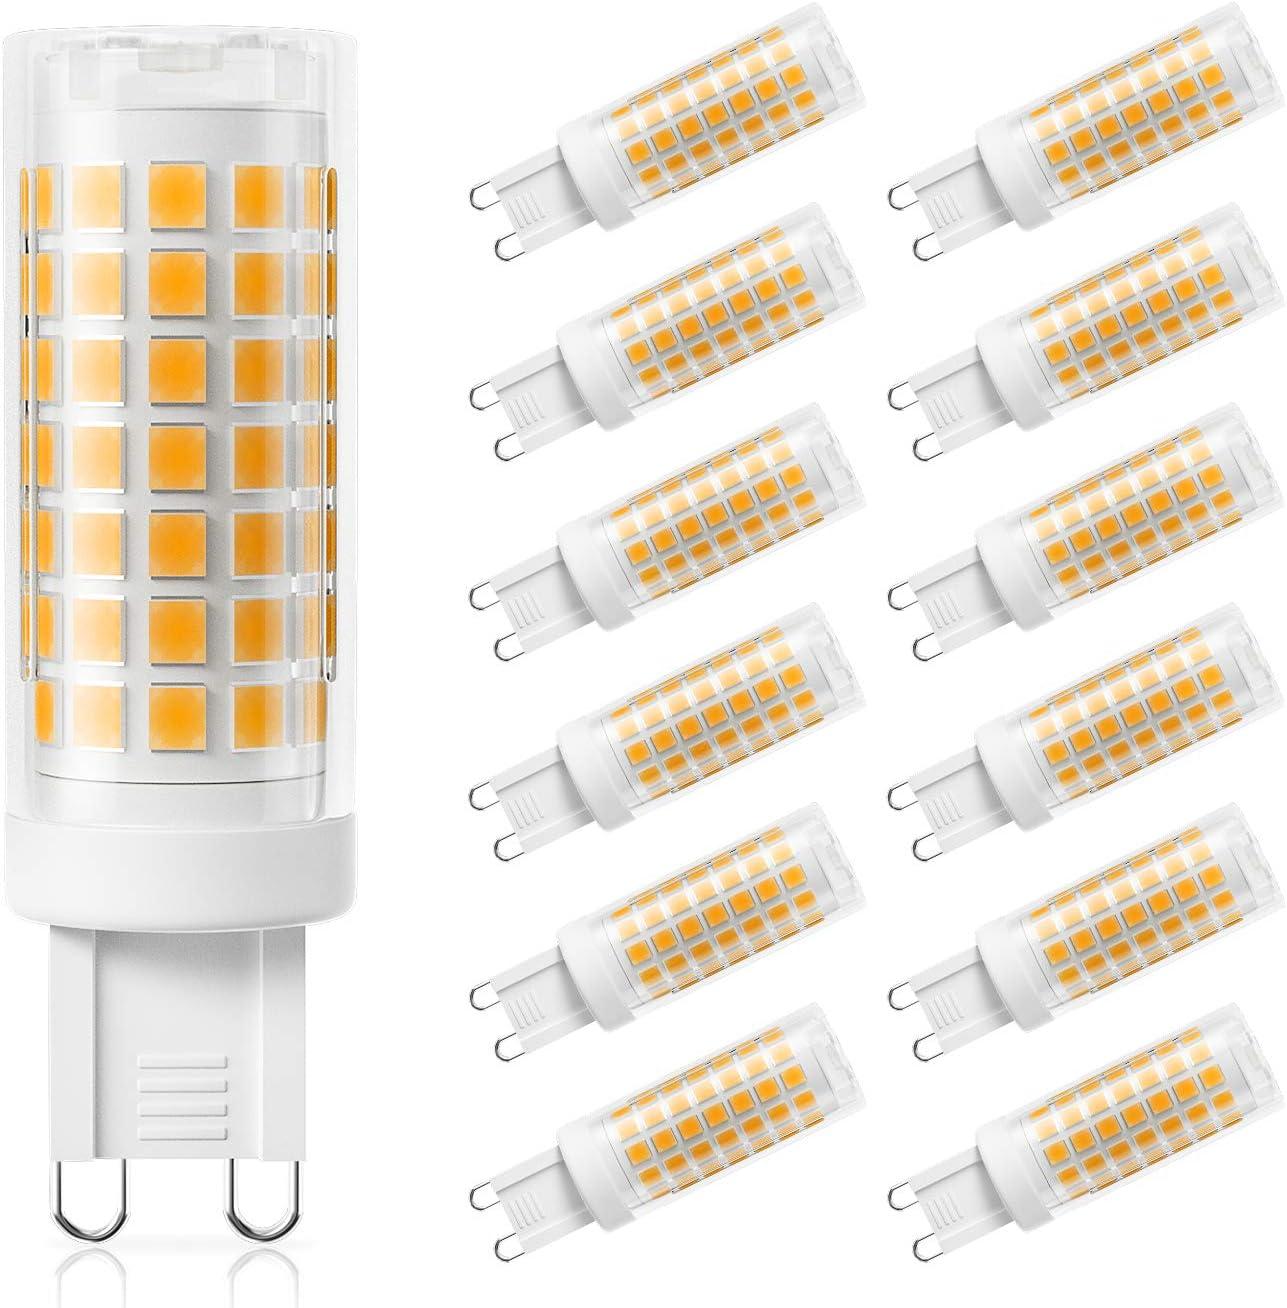 DiCUNO G12 LED Bulb Dimmable, 12W 12W Halogen Equivalent, 1230LM, Warm White  12K 12V Bi Pin Ceramic Base Light Bulbs for Chandelier, Home Lighting ...